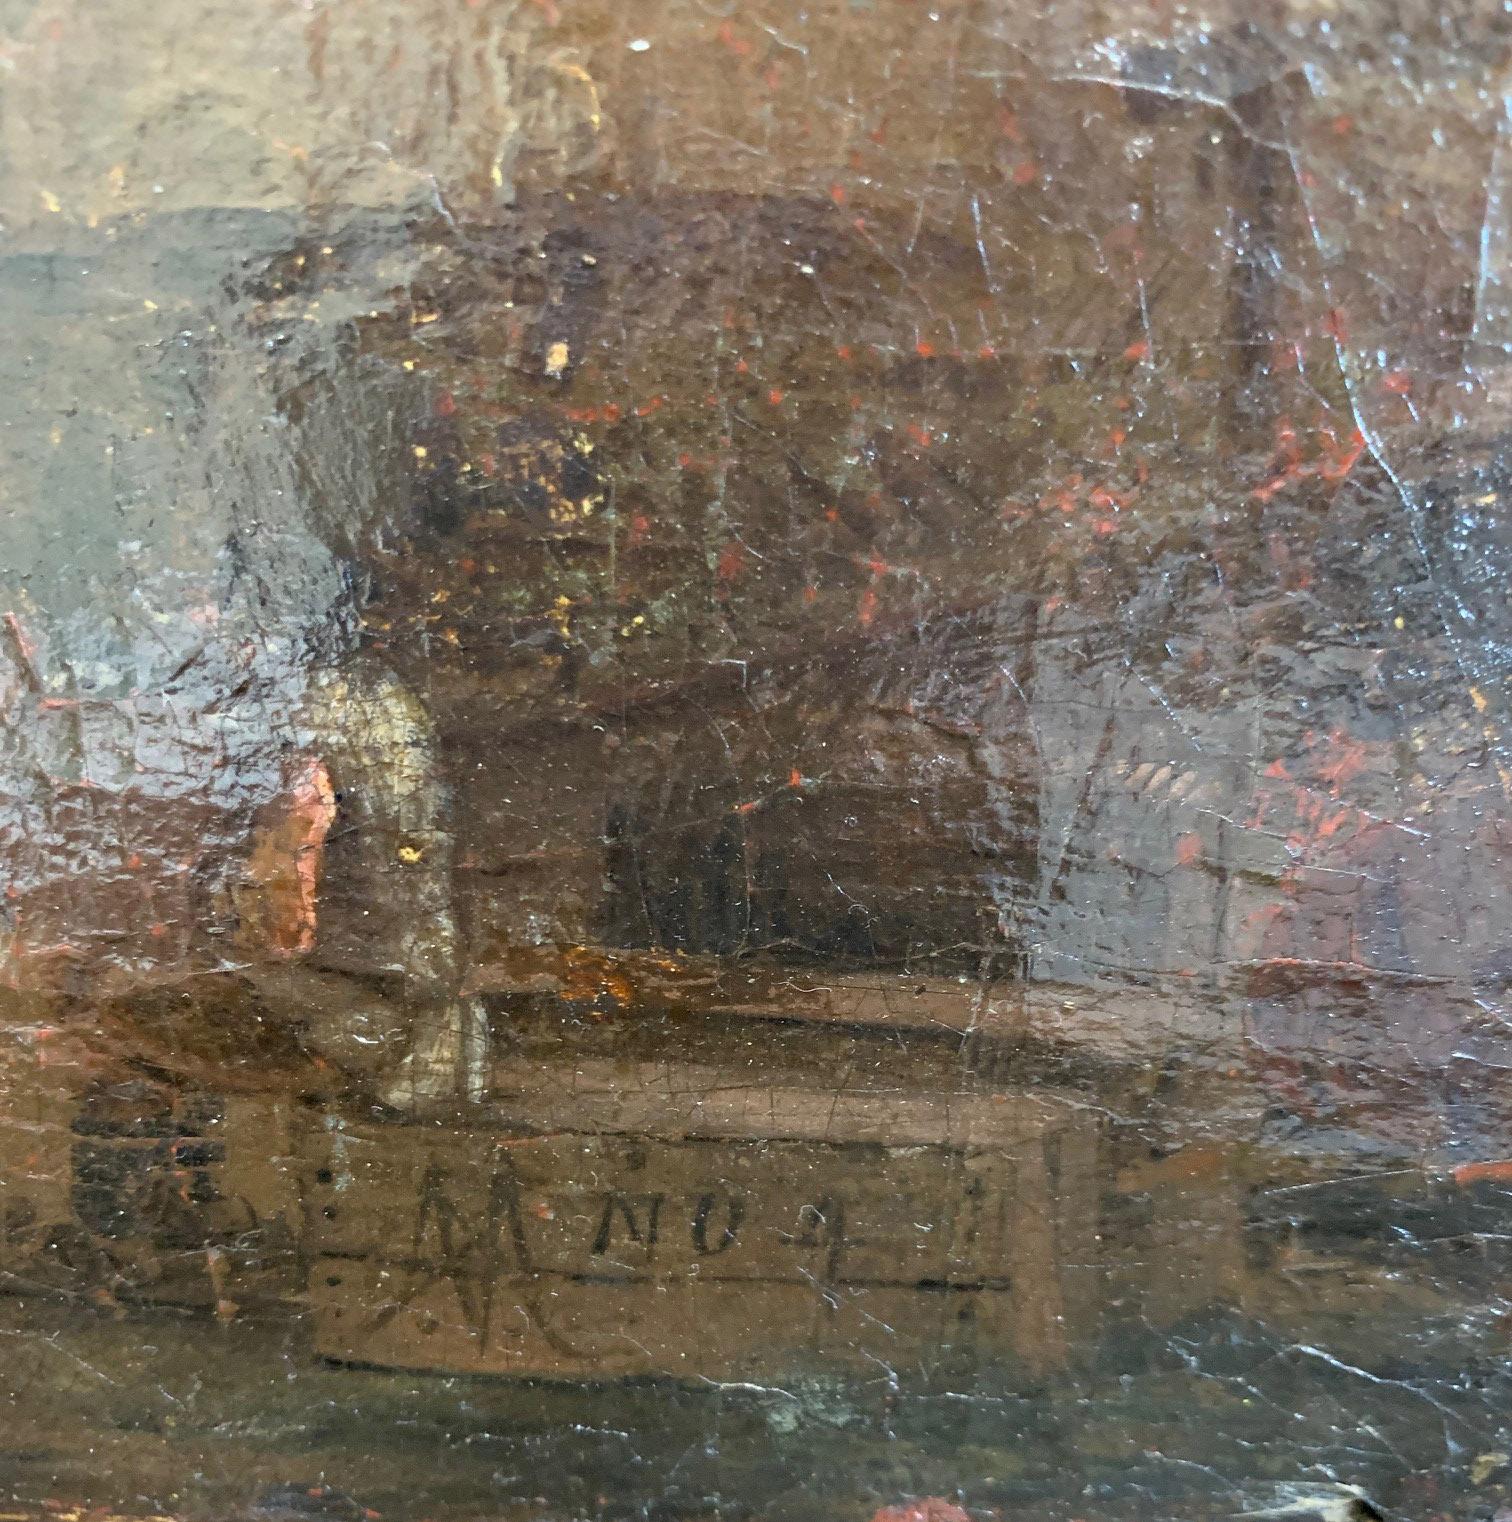 CIRCLE OF JAN VAN GOYEN, LEIDEN, 1596 - 1656, THE HAGUE, 17TH CENTURY OIL ON CANVAS River landscape, - Image 9 of 12